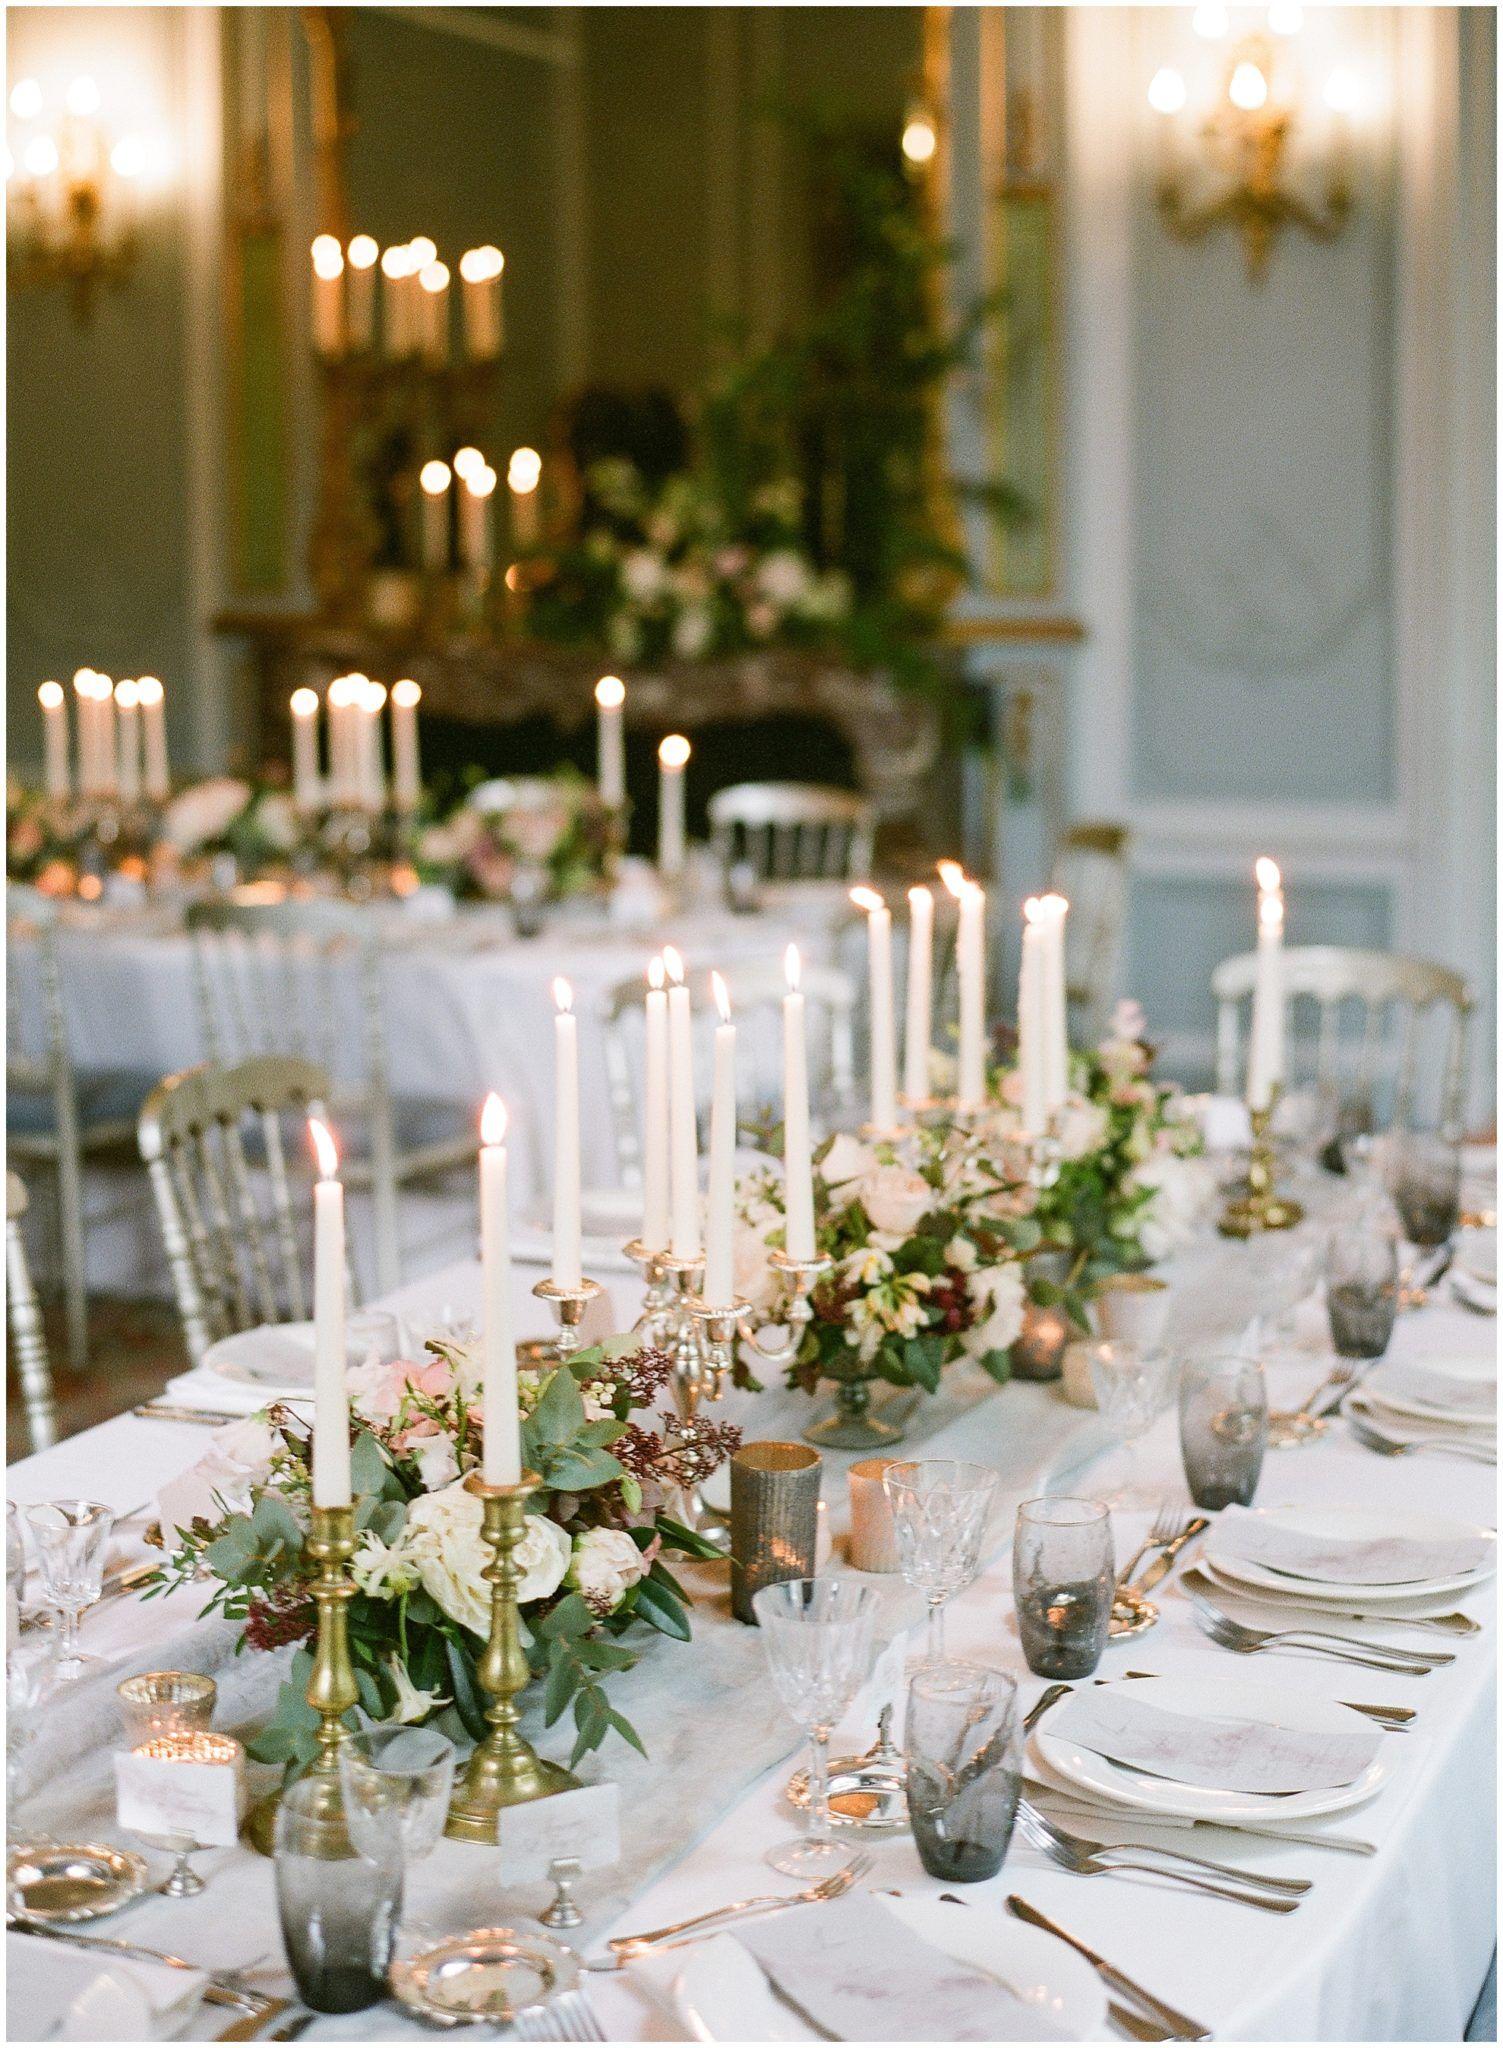 wedding in paris in 2019 | wedding decorations, glamorous